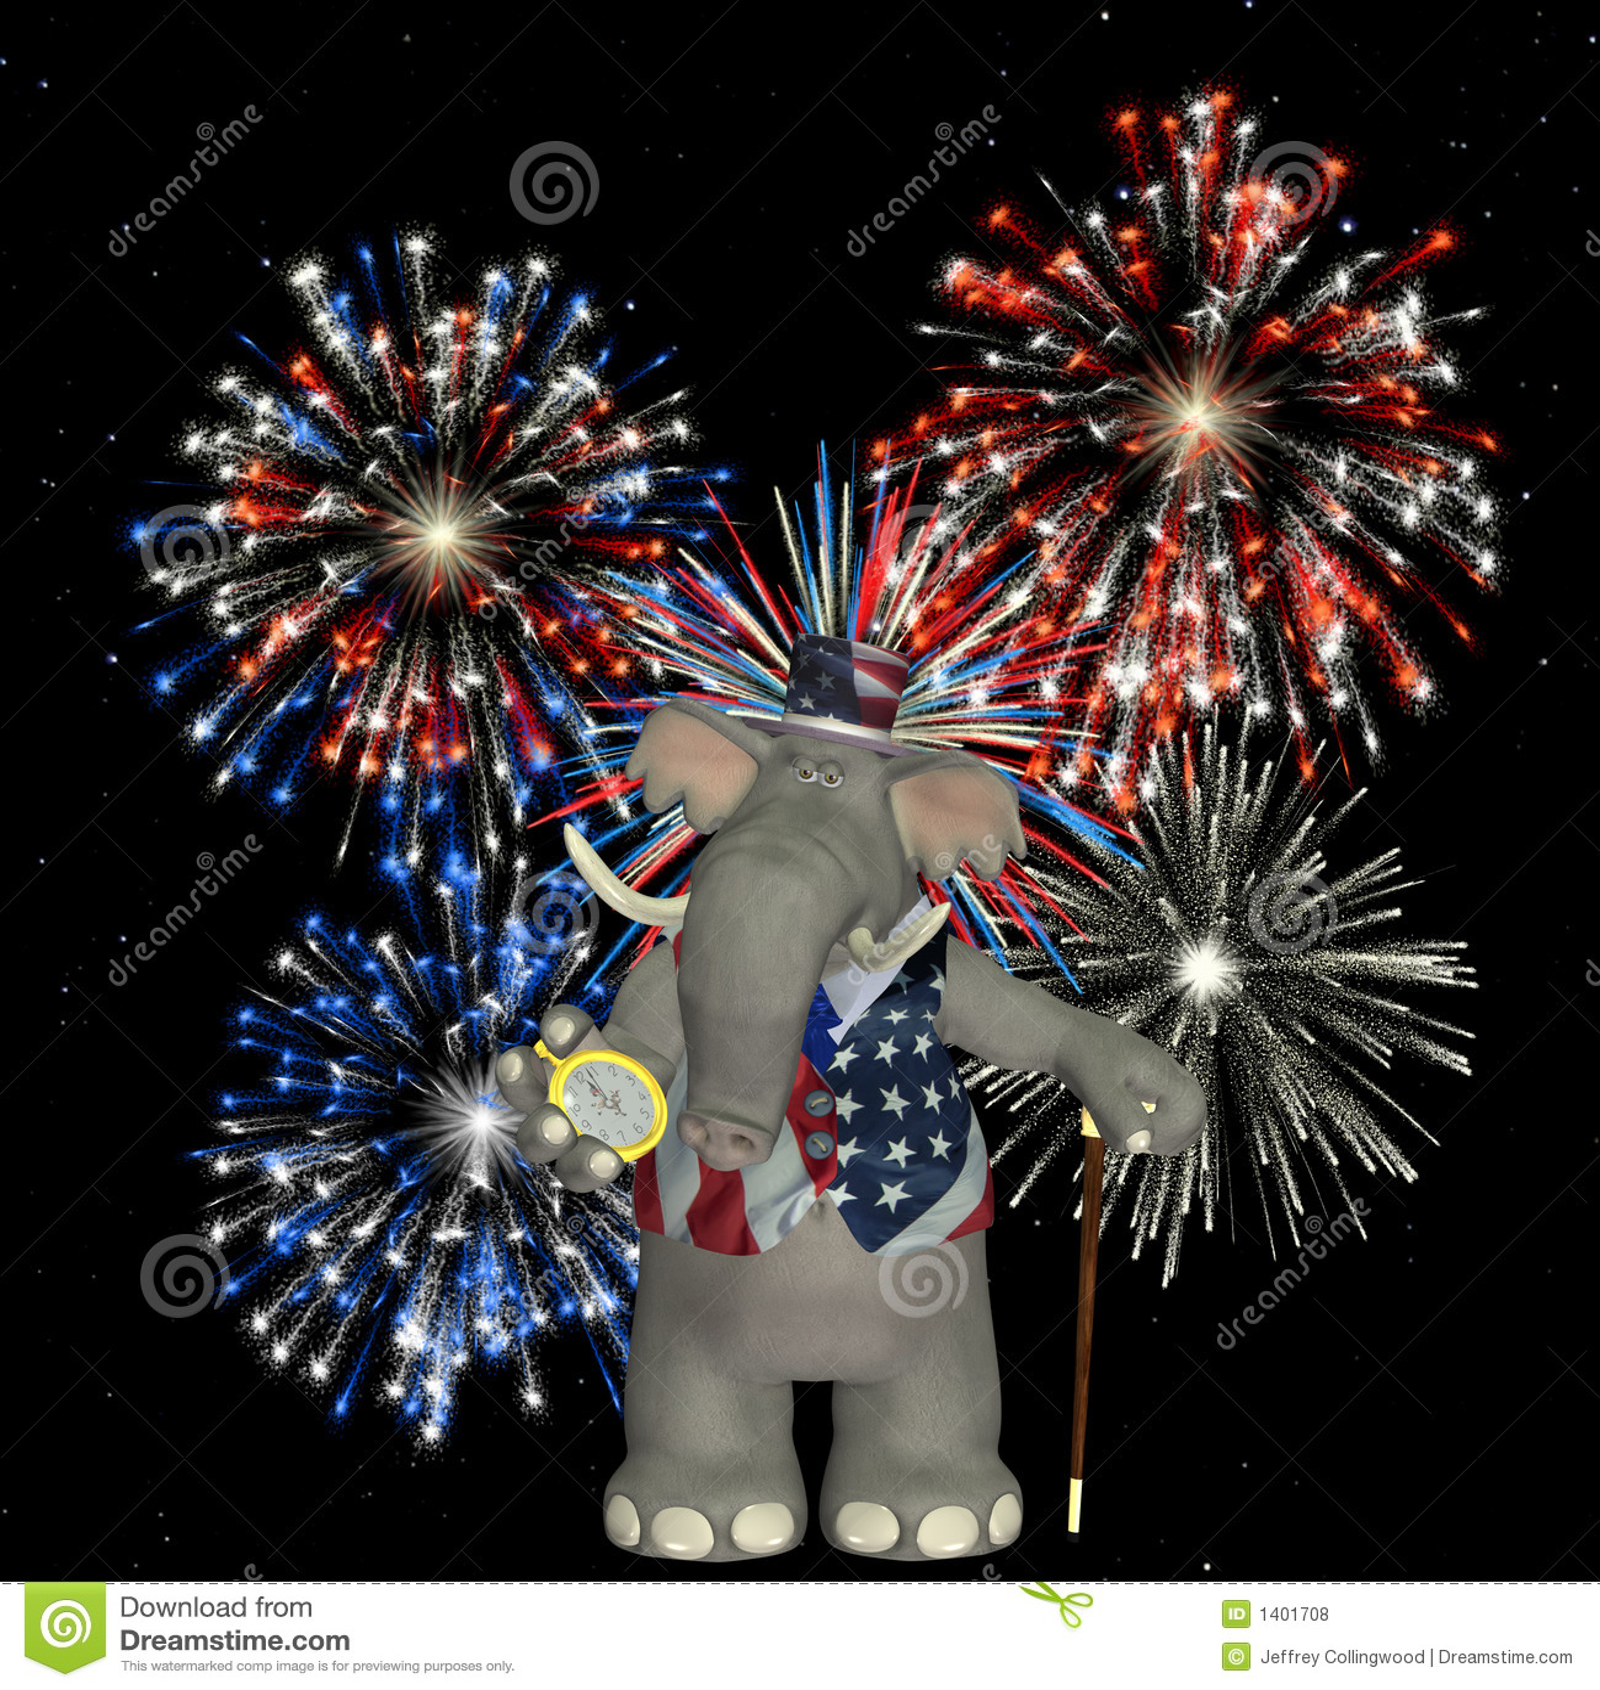 political-elephant-fireworks-1401708.jpg